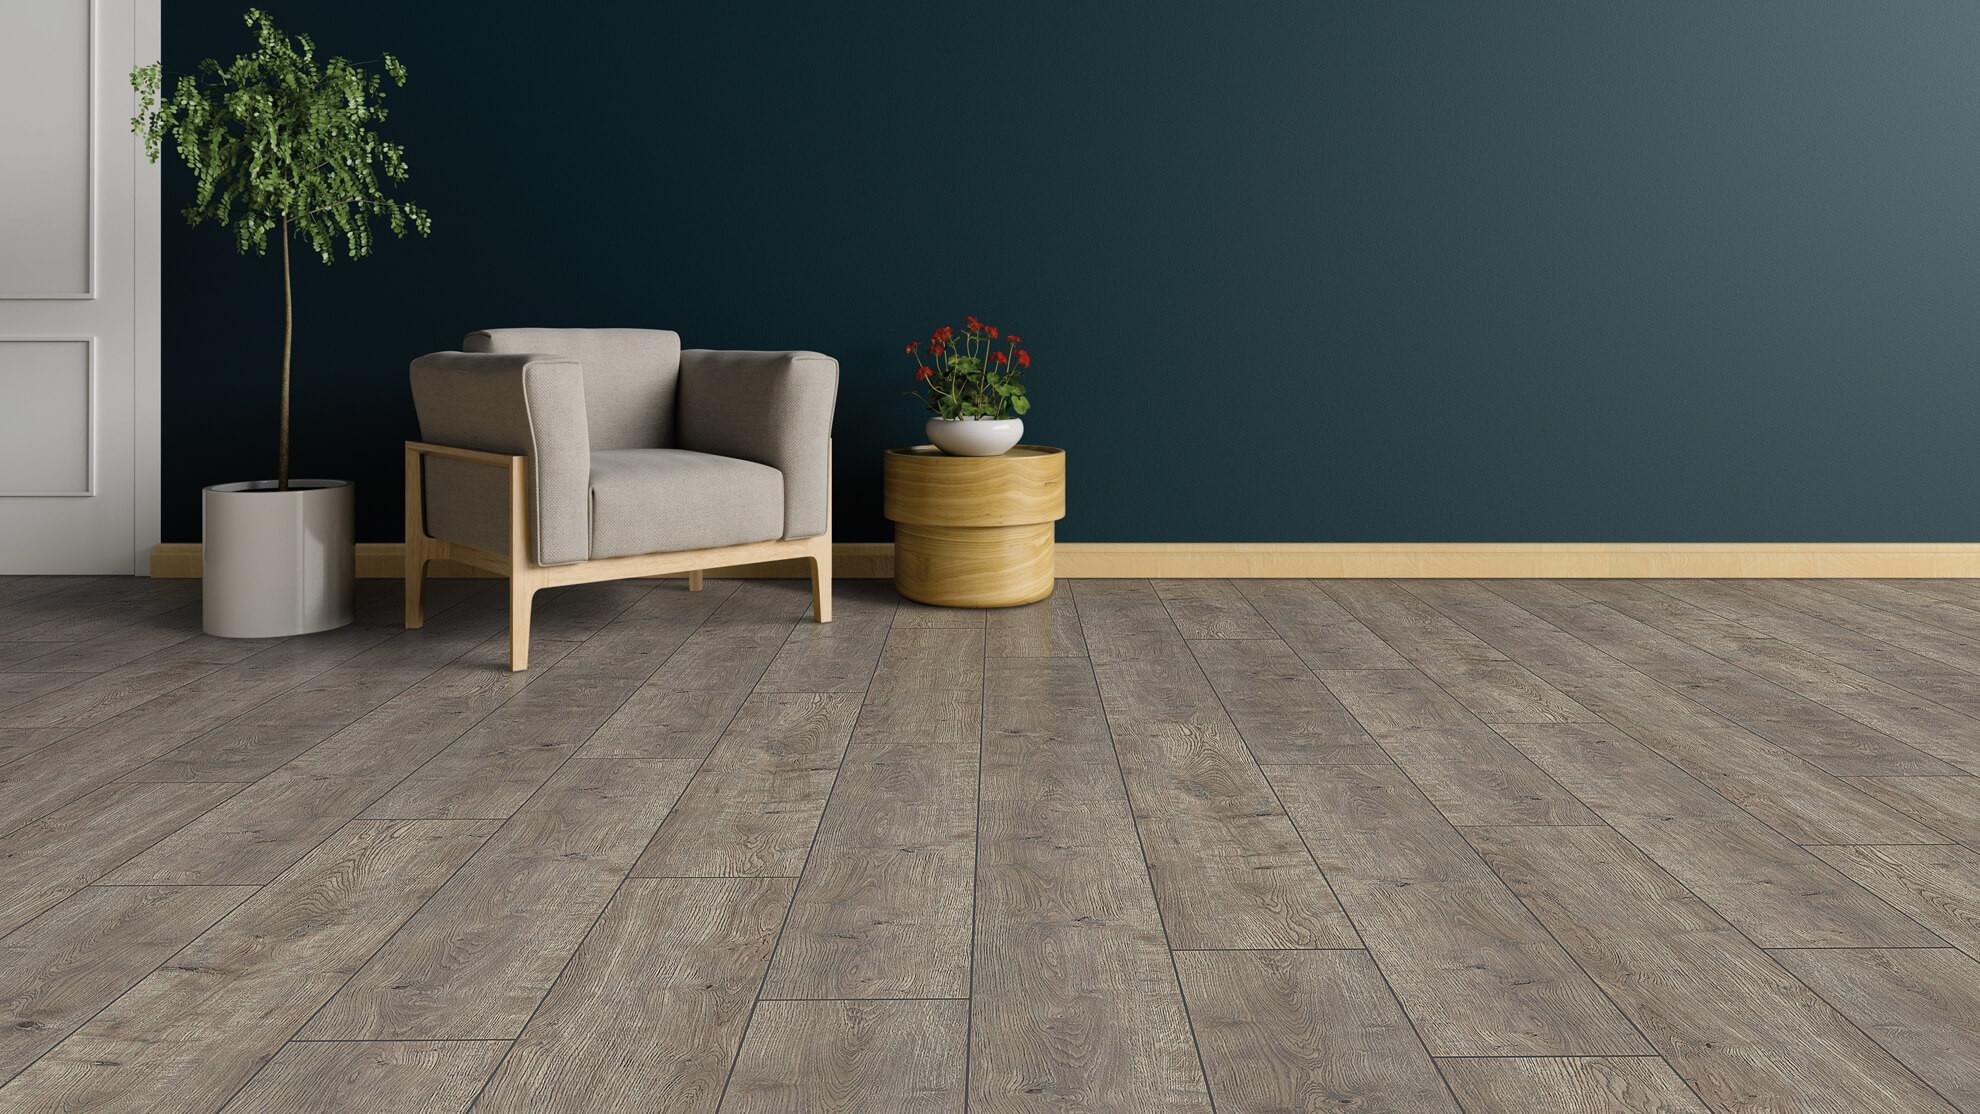 quality hardwood floors san marcos tx of earthwerks flooring in parkhill plus xxl manhattan fog pkh 357